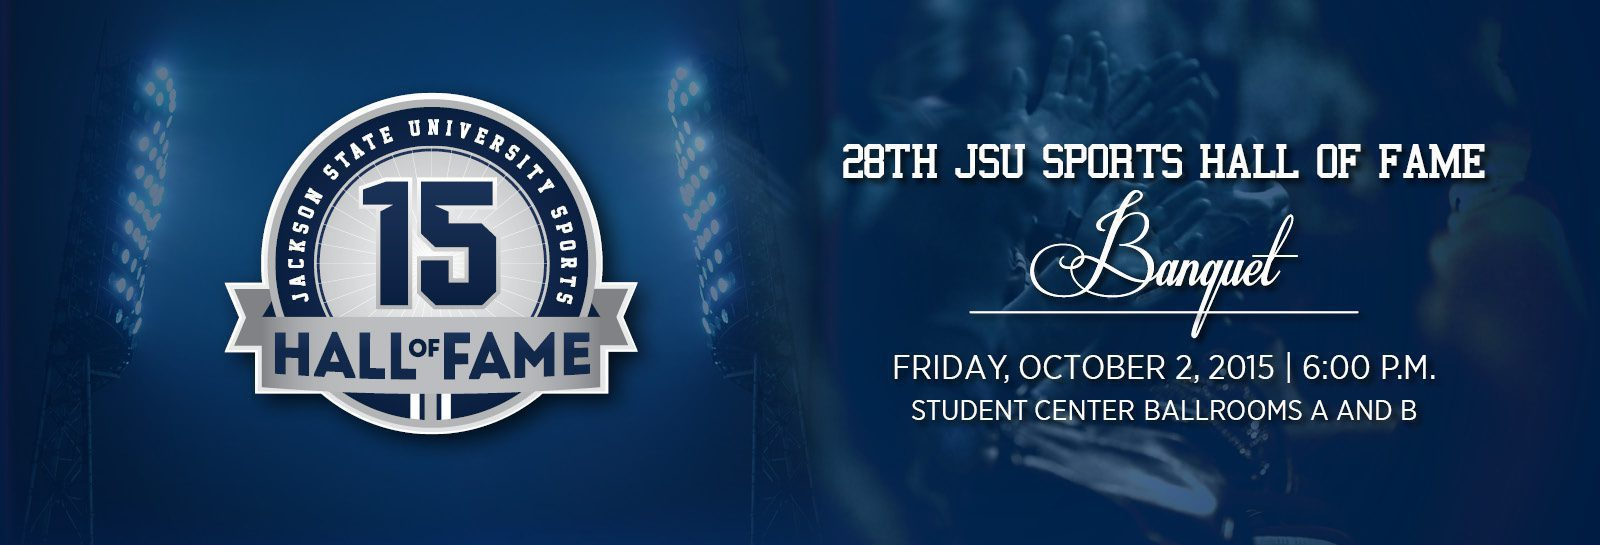 JSU SHOF marketing_JSU Home Webpage Slide